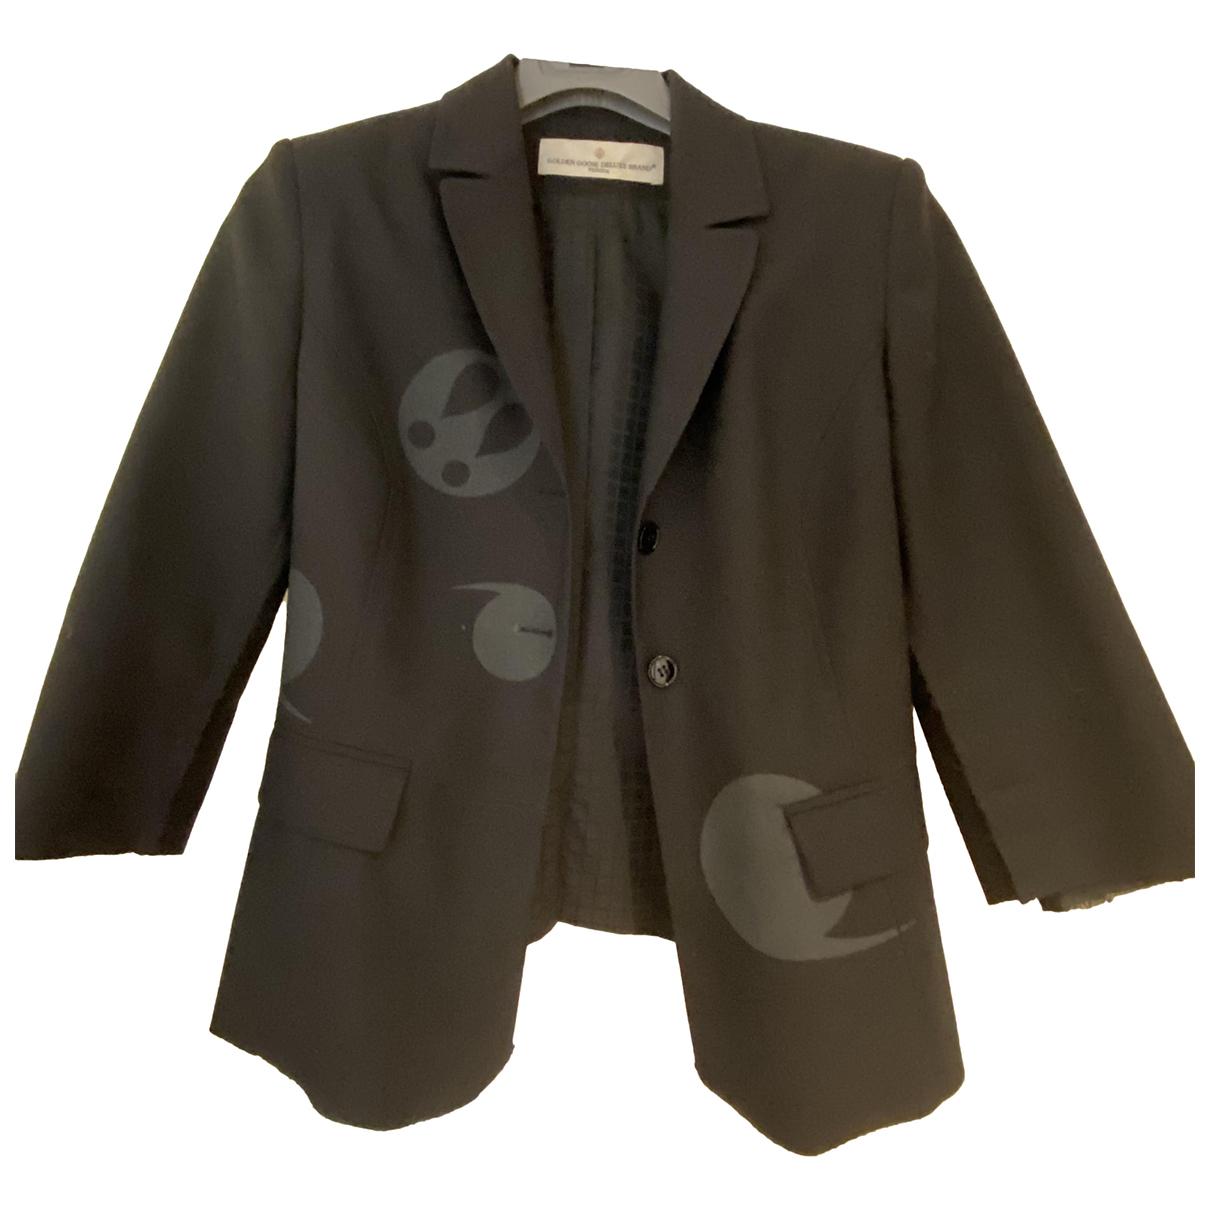 Golden Goose \N Black Wool jacket for Women M International